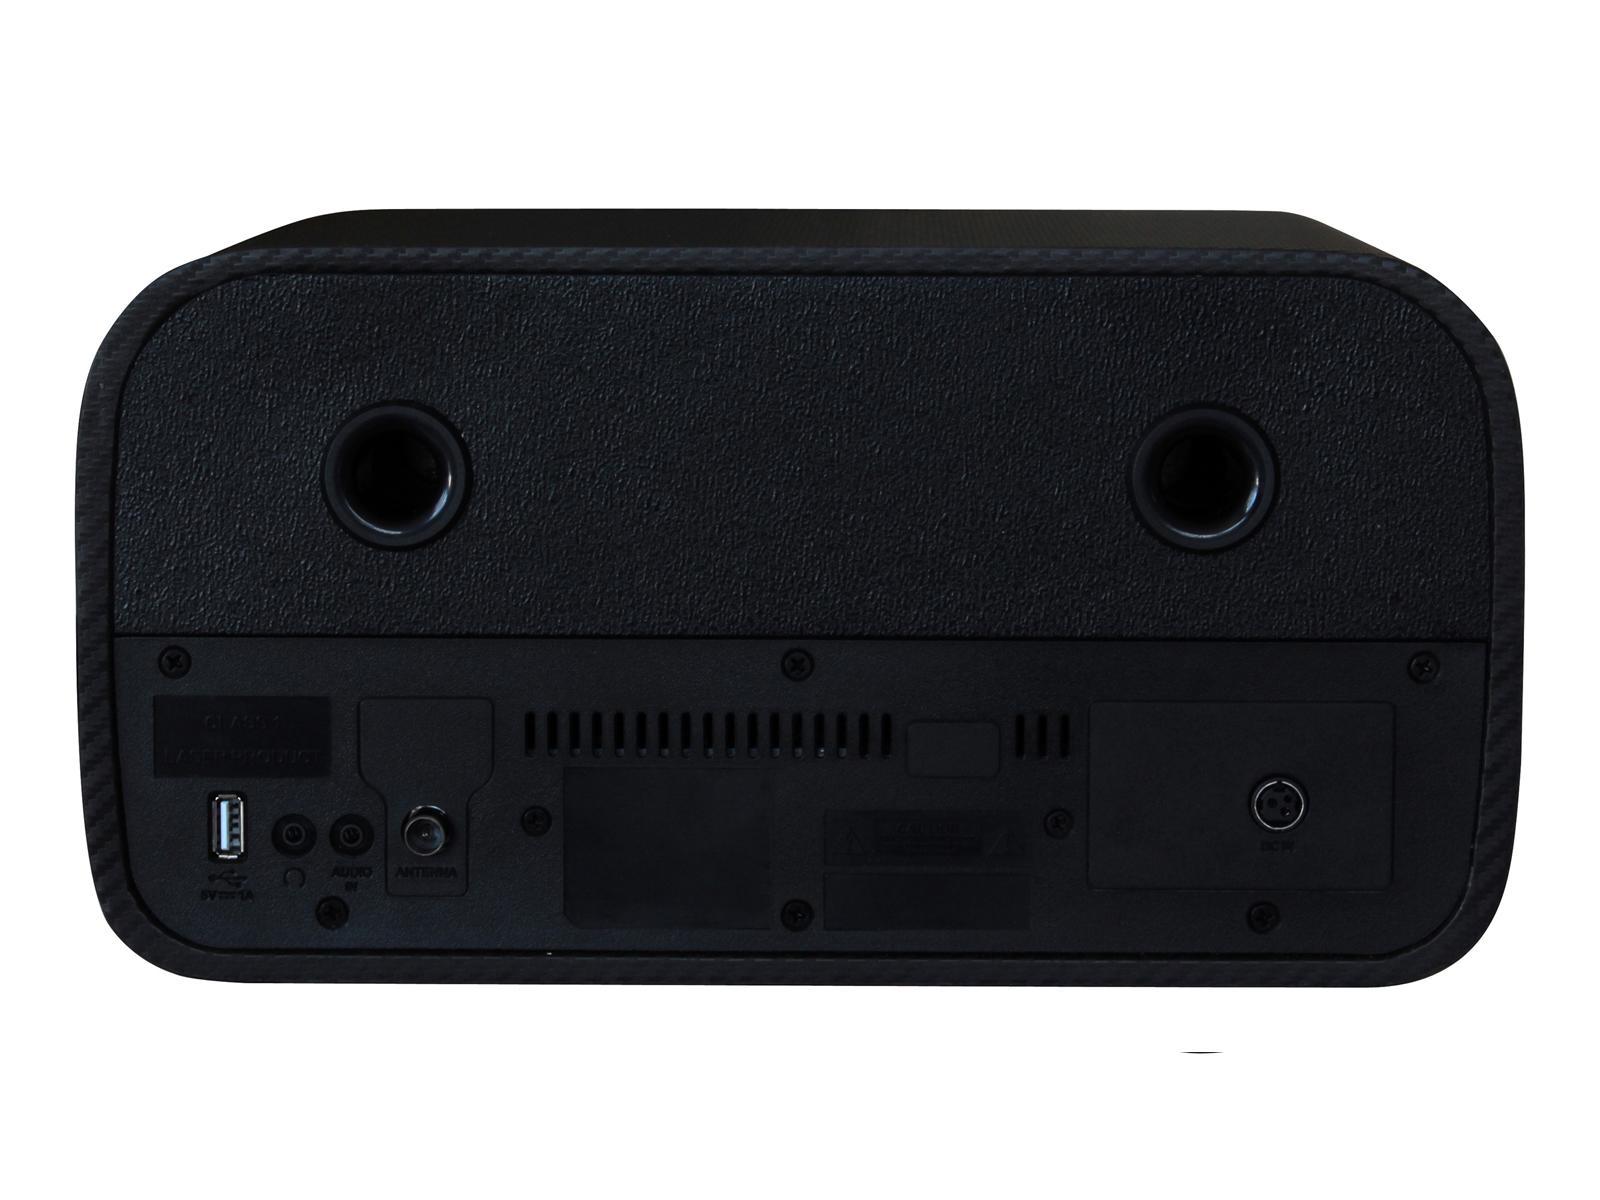 Buy Soundmaster Icd3030ca Spotify Bluetooth Cd Player